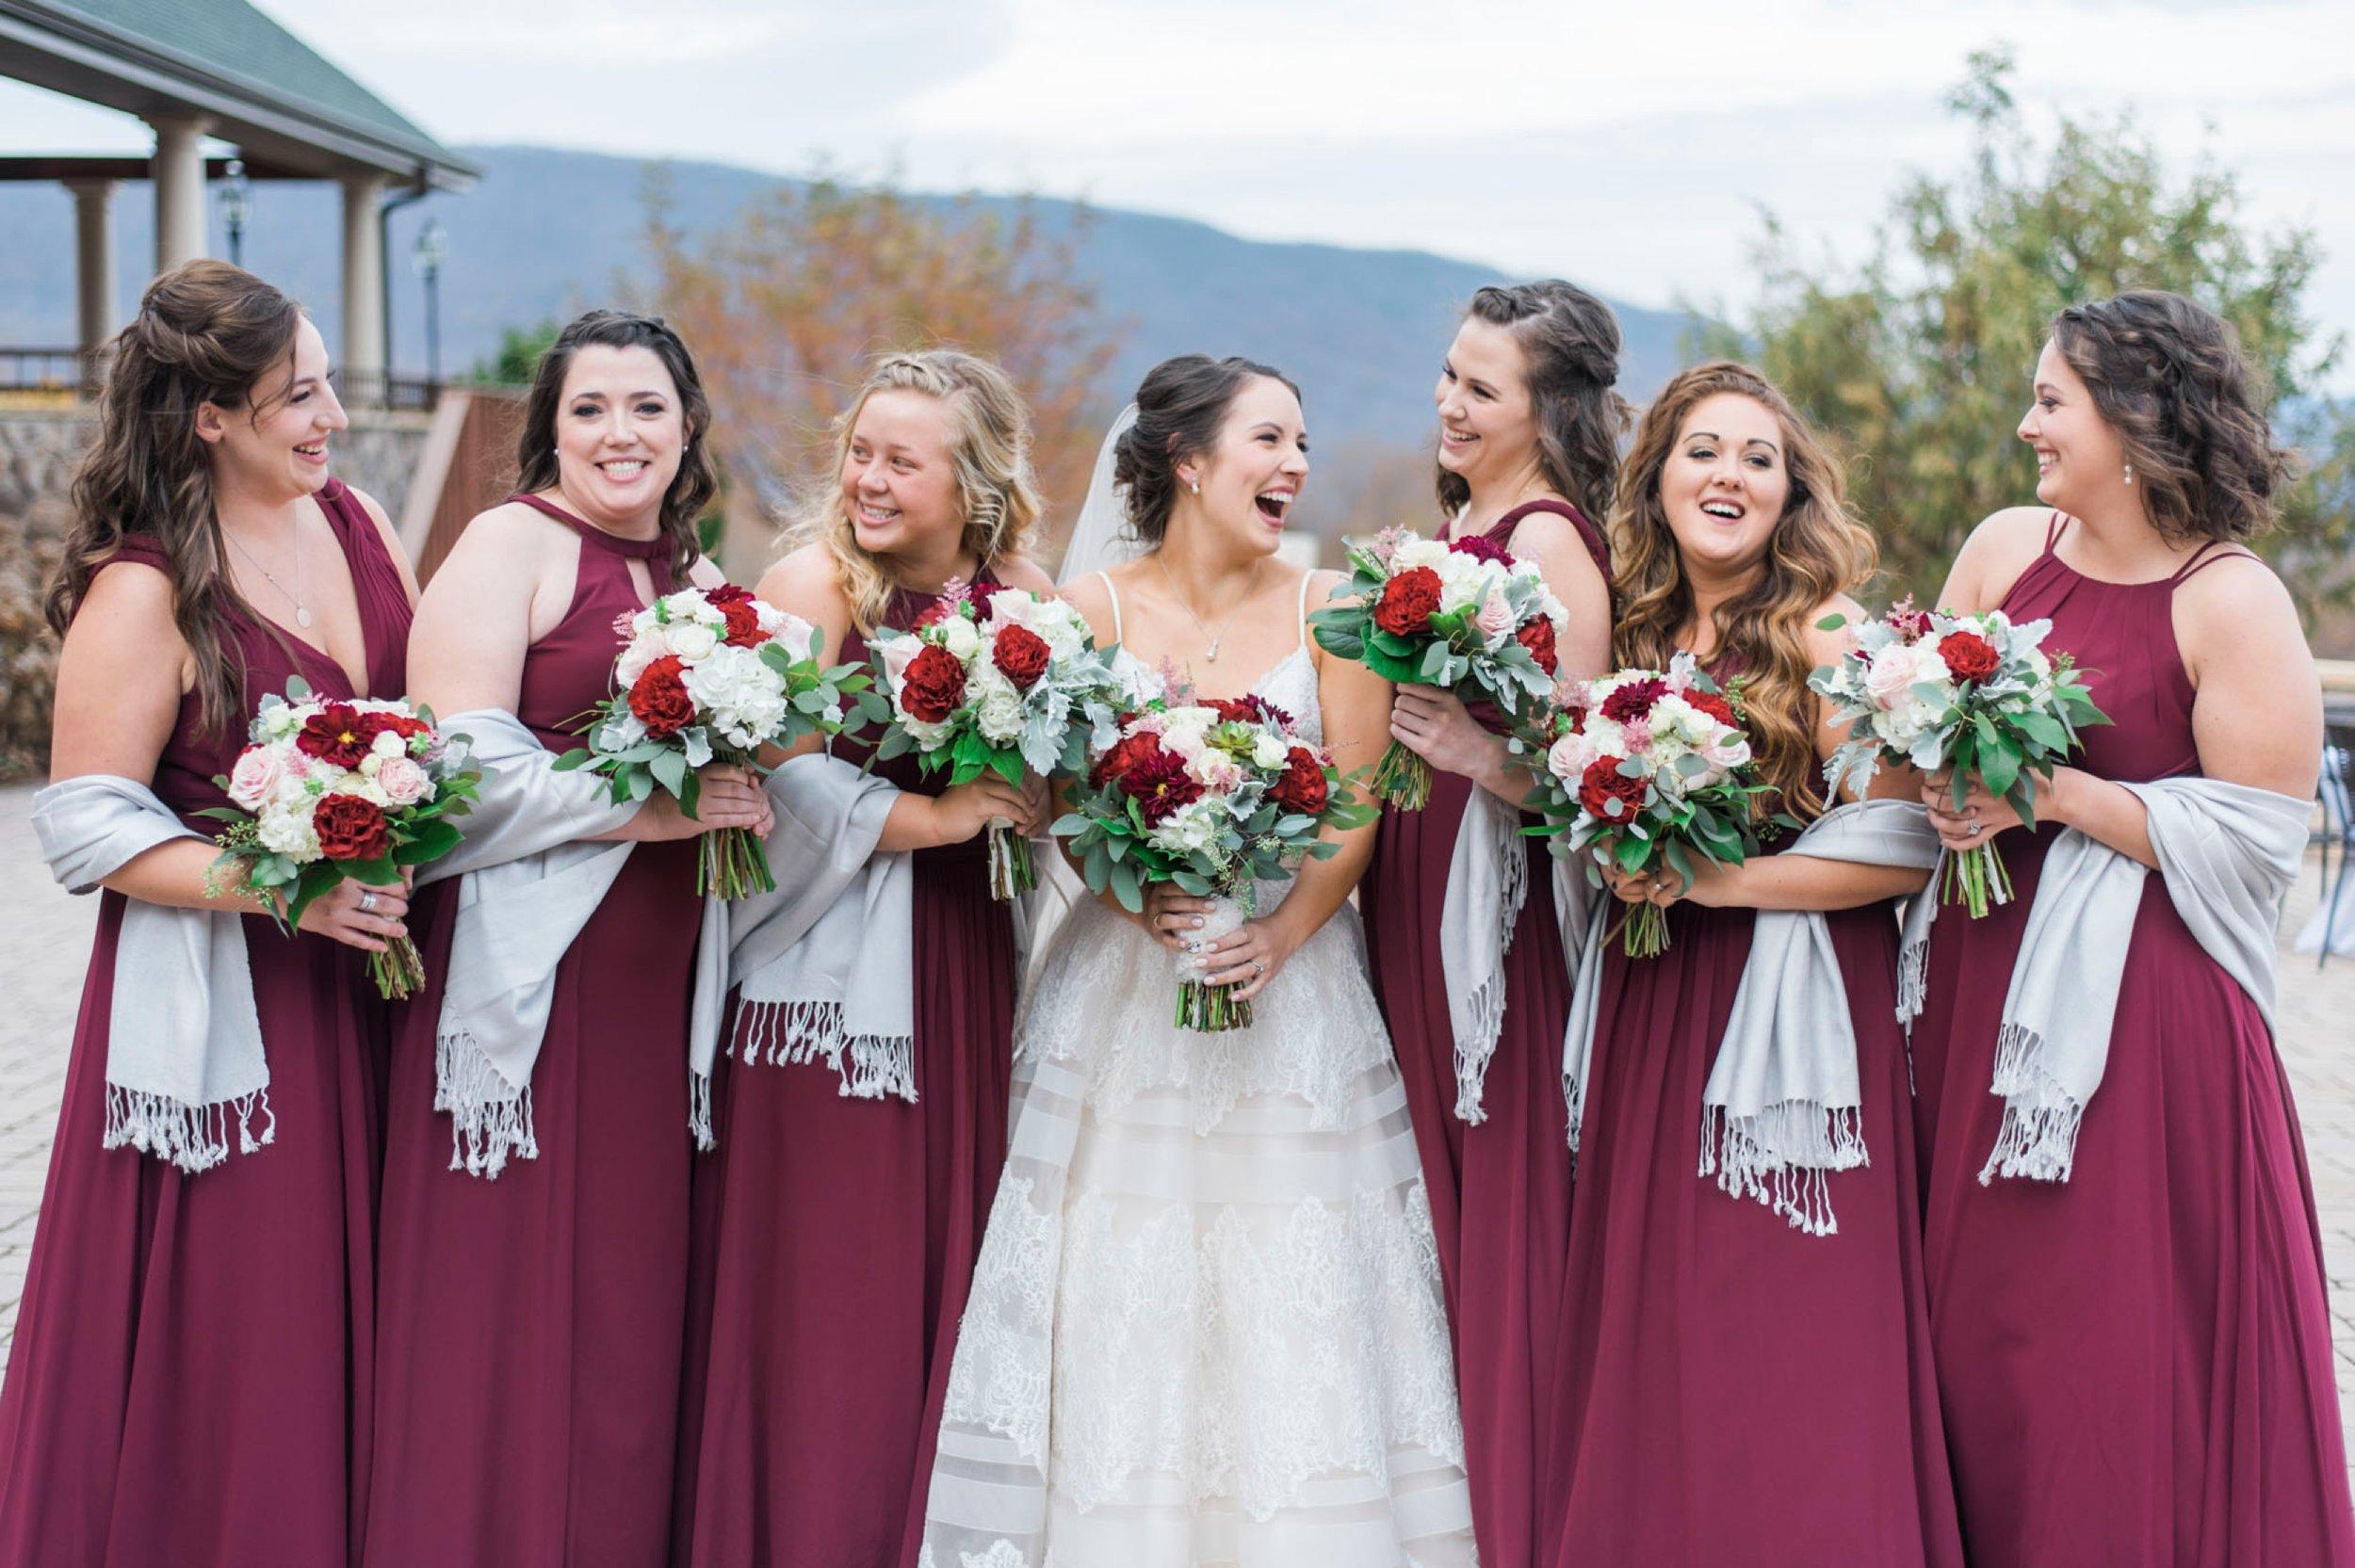 IrvineEstate_LexingtonVA_Wedding_FallWedding_VirginiaWeddingPhotographer 38.jpg